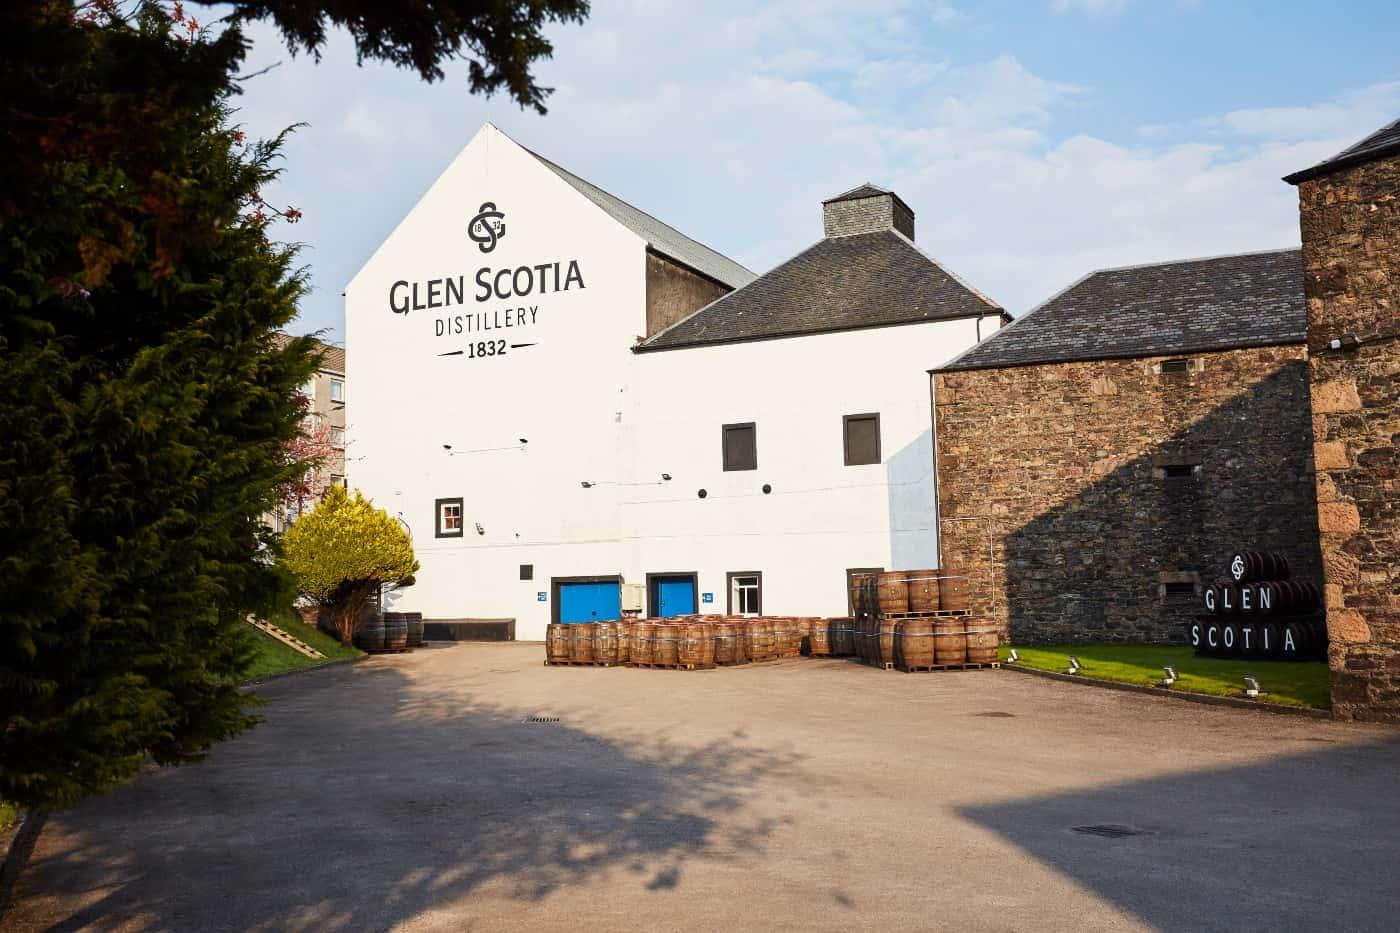 glen scotia distillery exterior 2